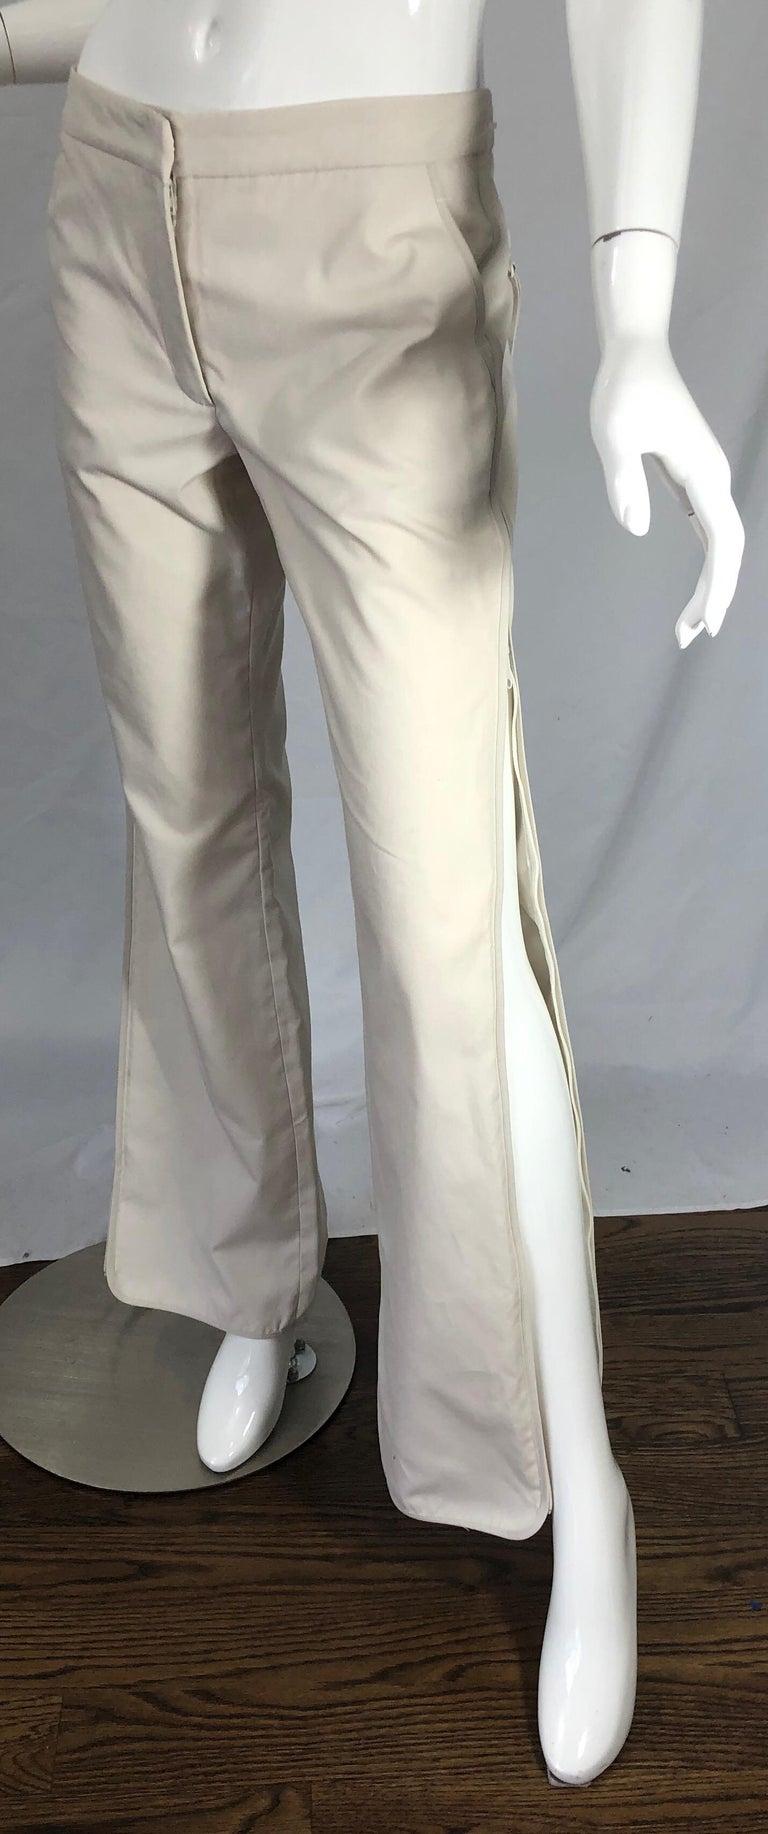 1990s Katayone Adeli Size 6 Zipper Leg Low Rise Stone Khaki Trousers Pants  For Sale 10